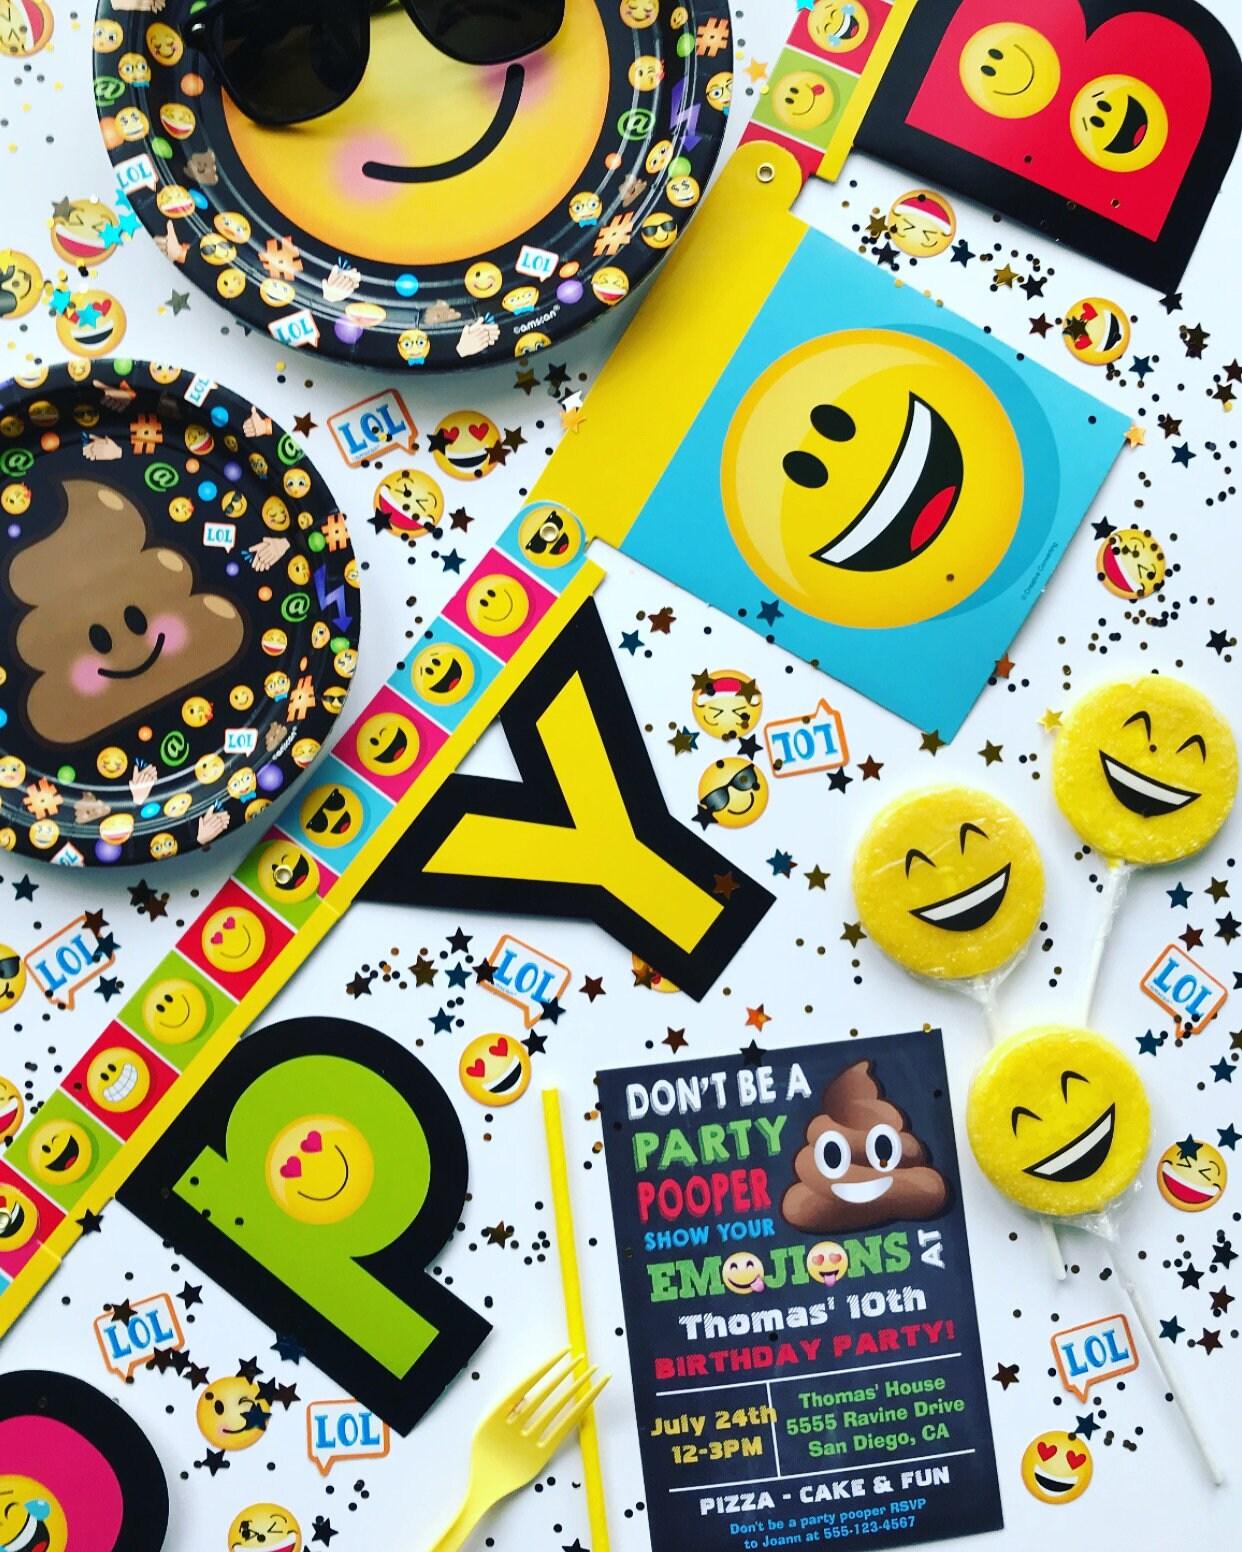 Kids Birthday Party Decorations Theme Emoji